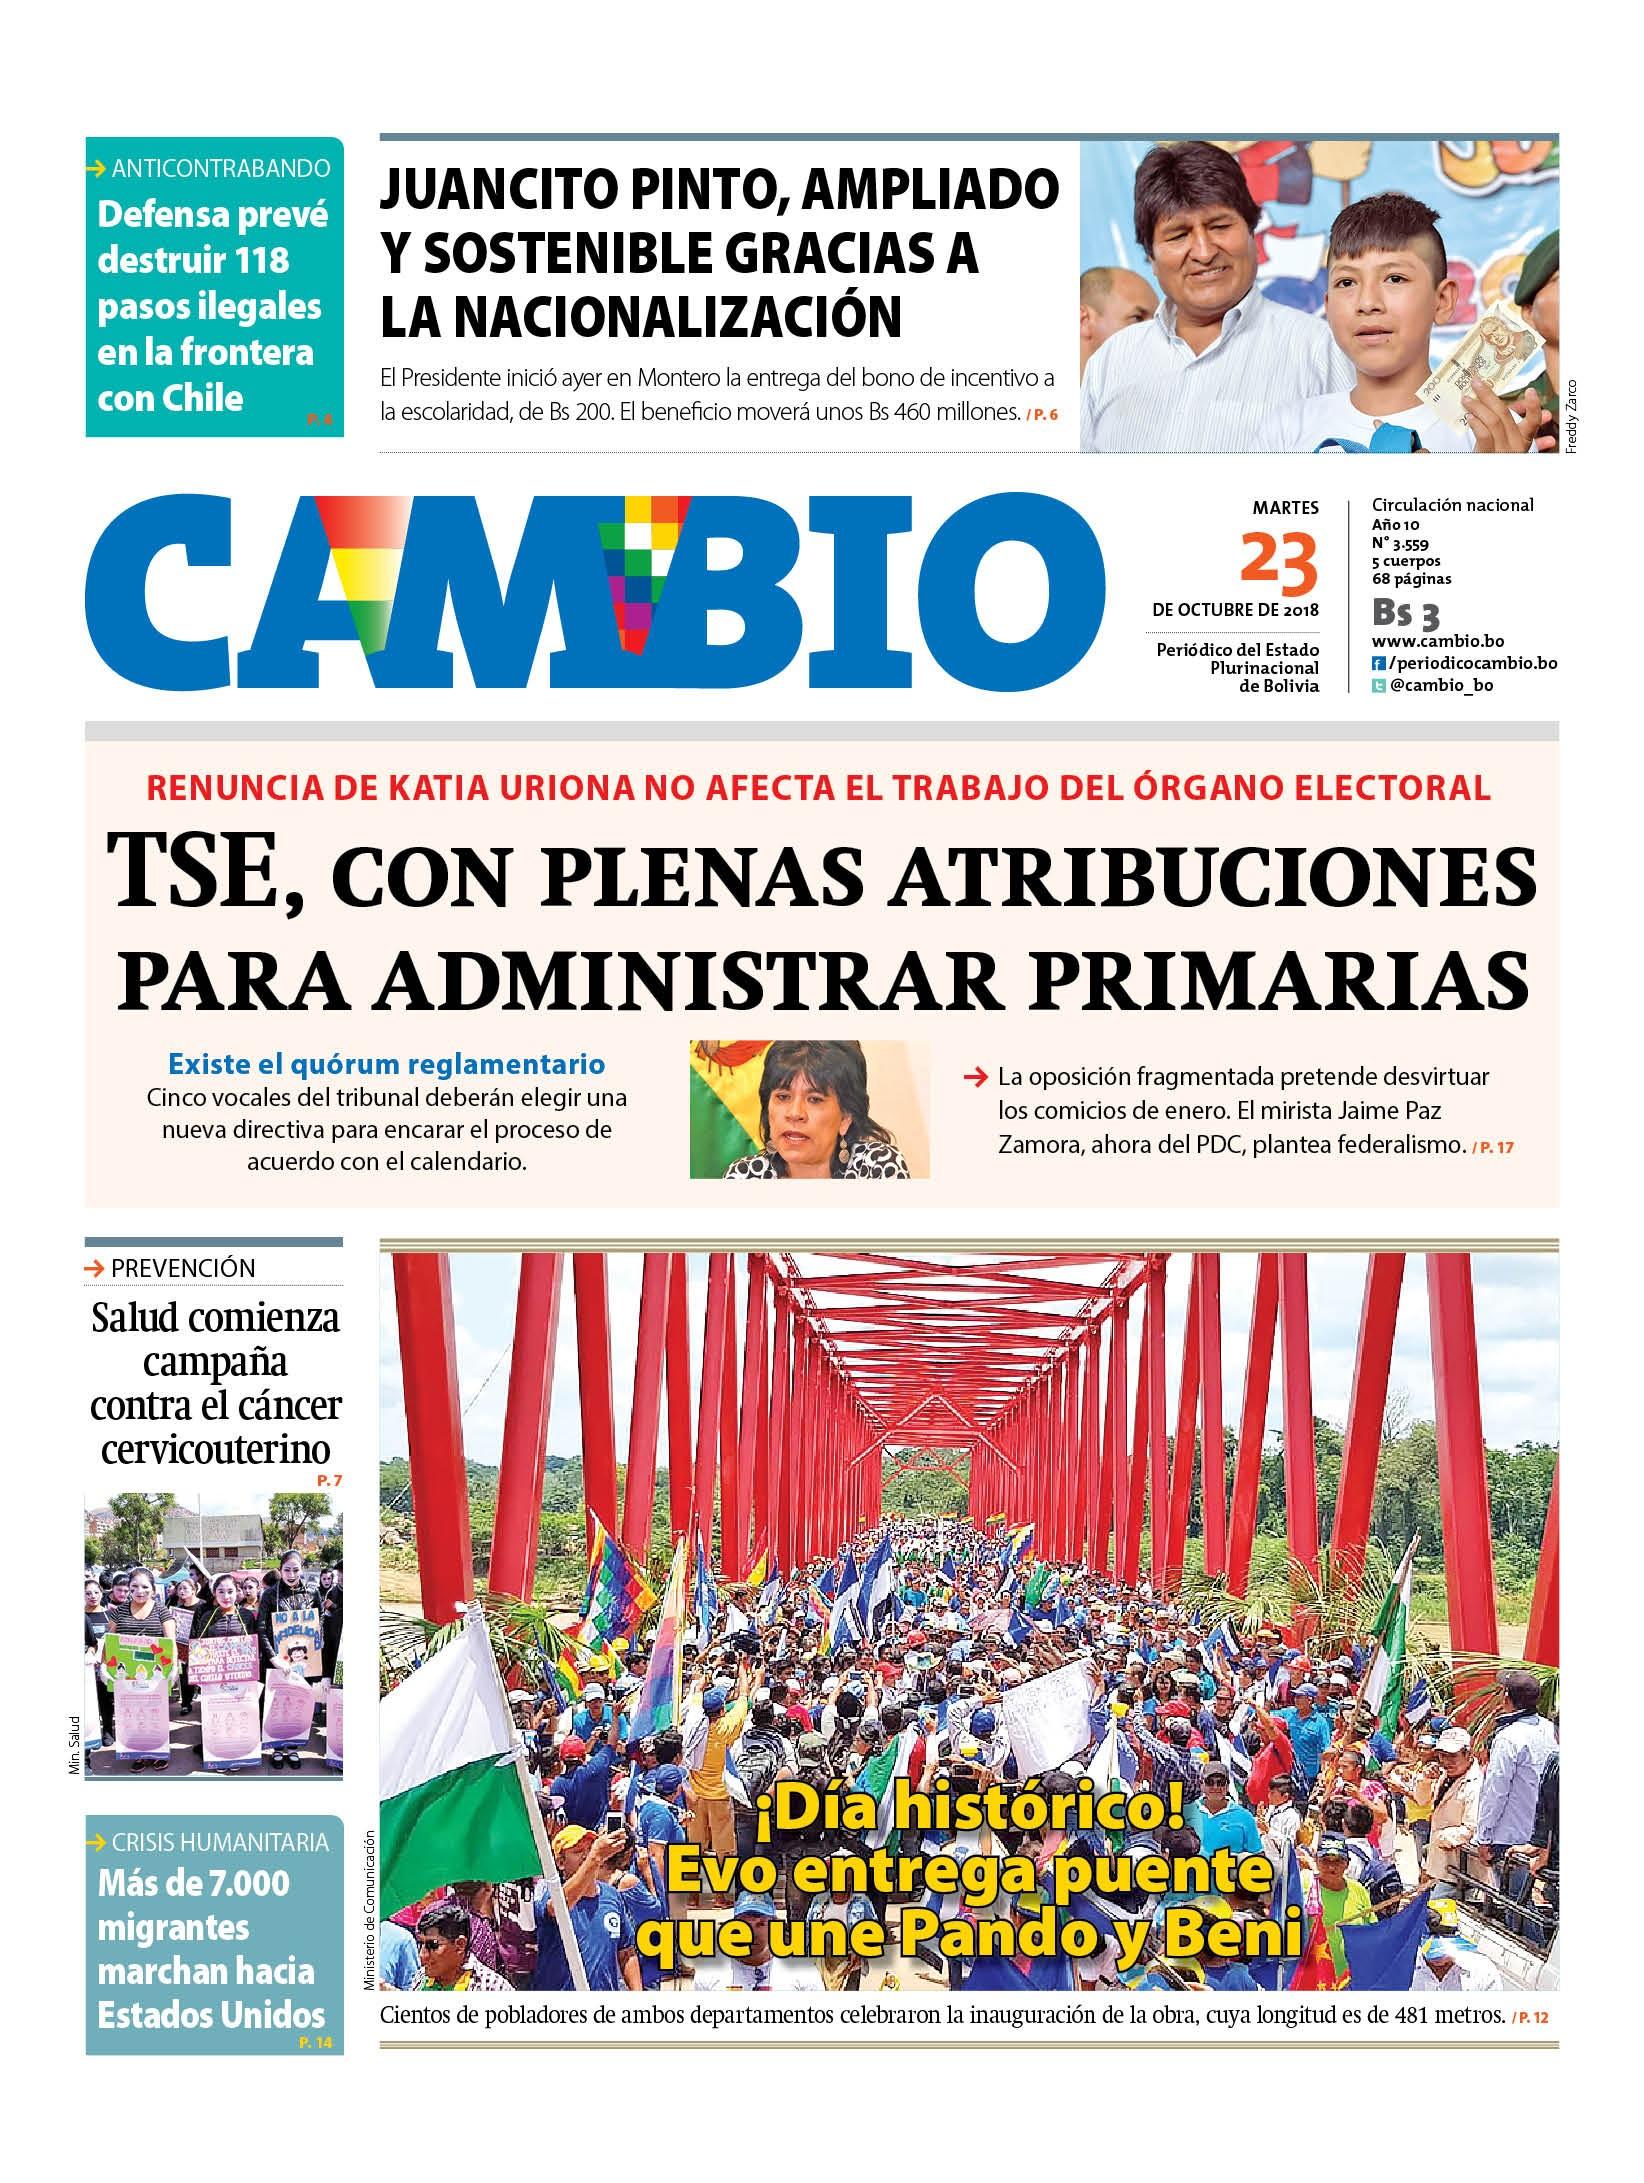 ABI Agencia Boliviana de Informaci³n v2018